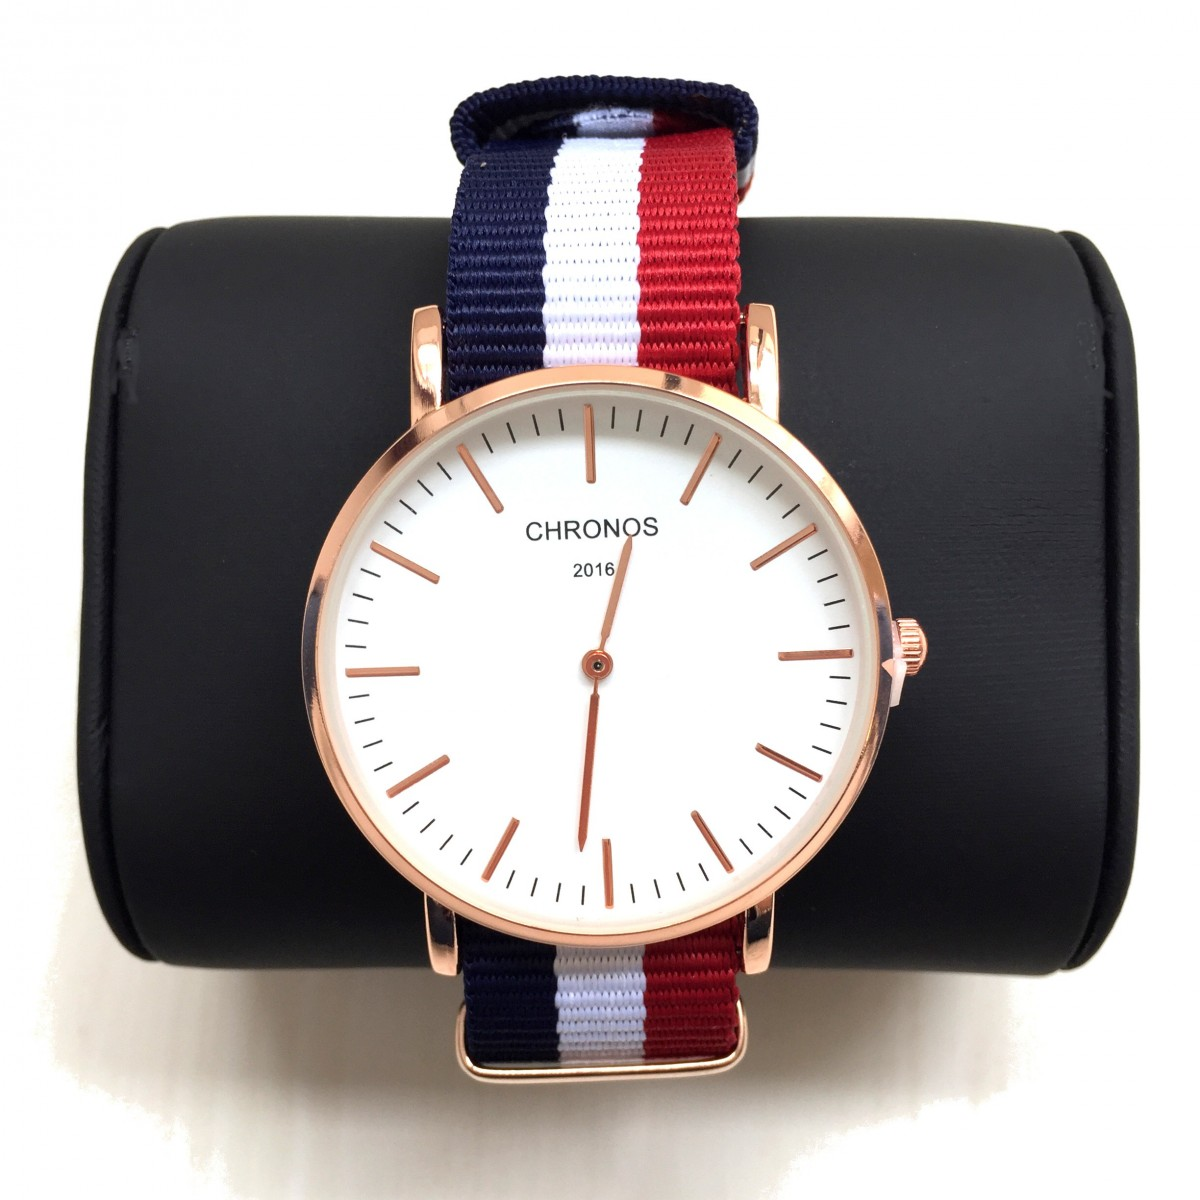 quality design 9fc34 ed17e *ボーダー ペアウォッチ* カジュアル腕時計